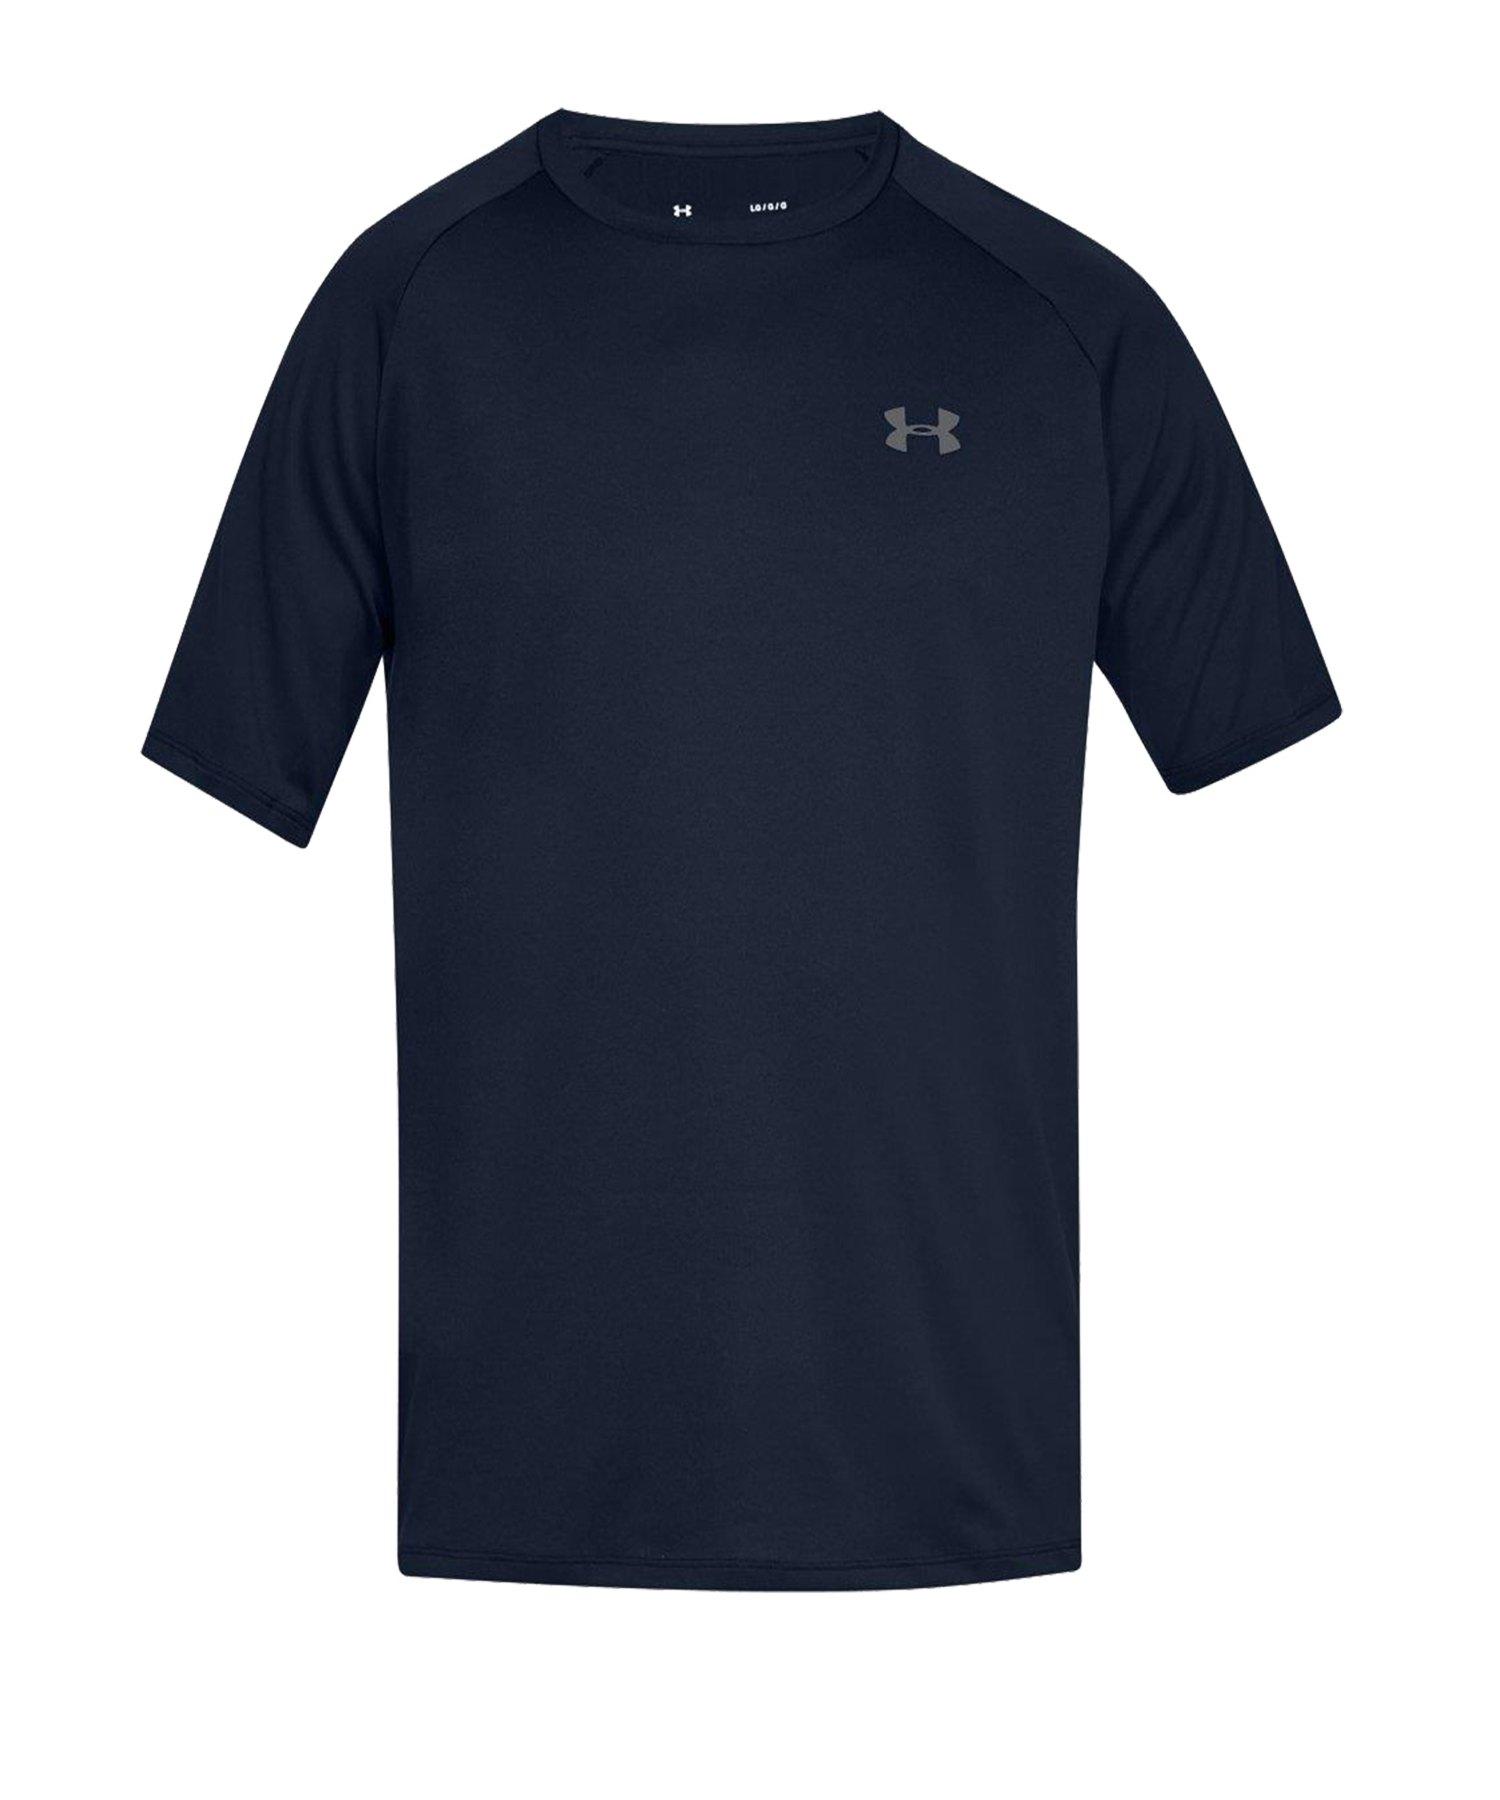 Under Armour Tech T-Shirt Blau F408 - blau